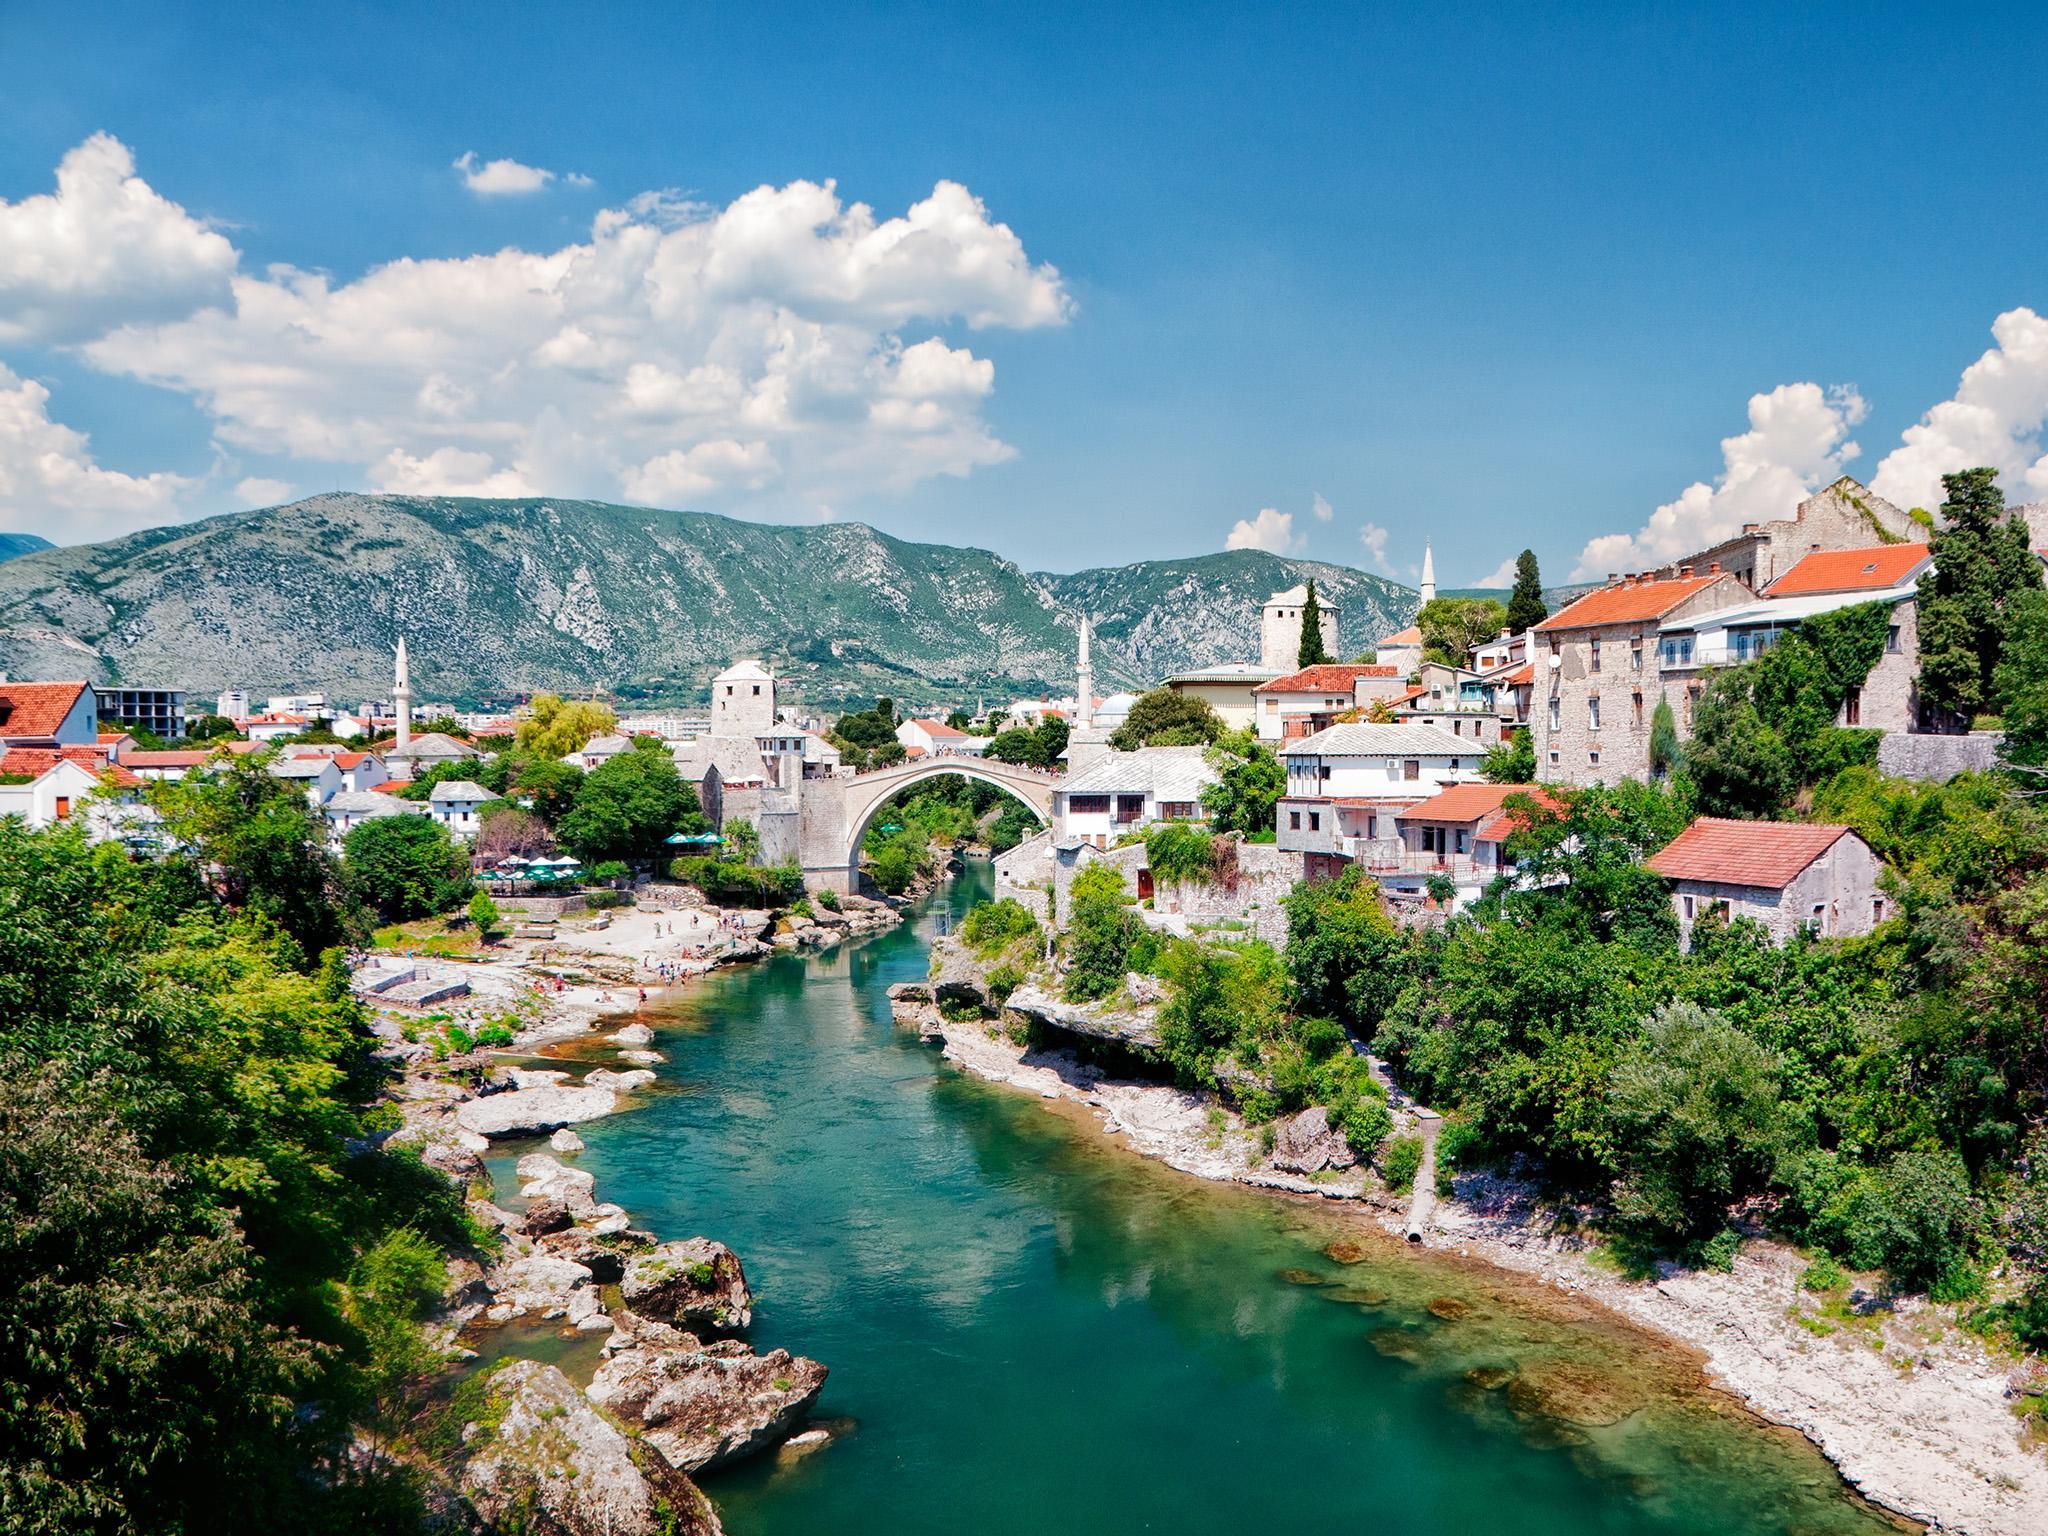 4. Herzegovina, Bosnia and Herzegovina